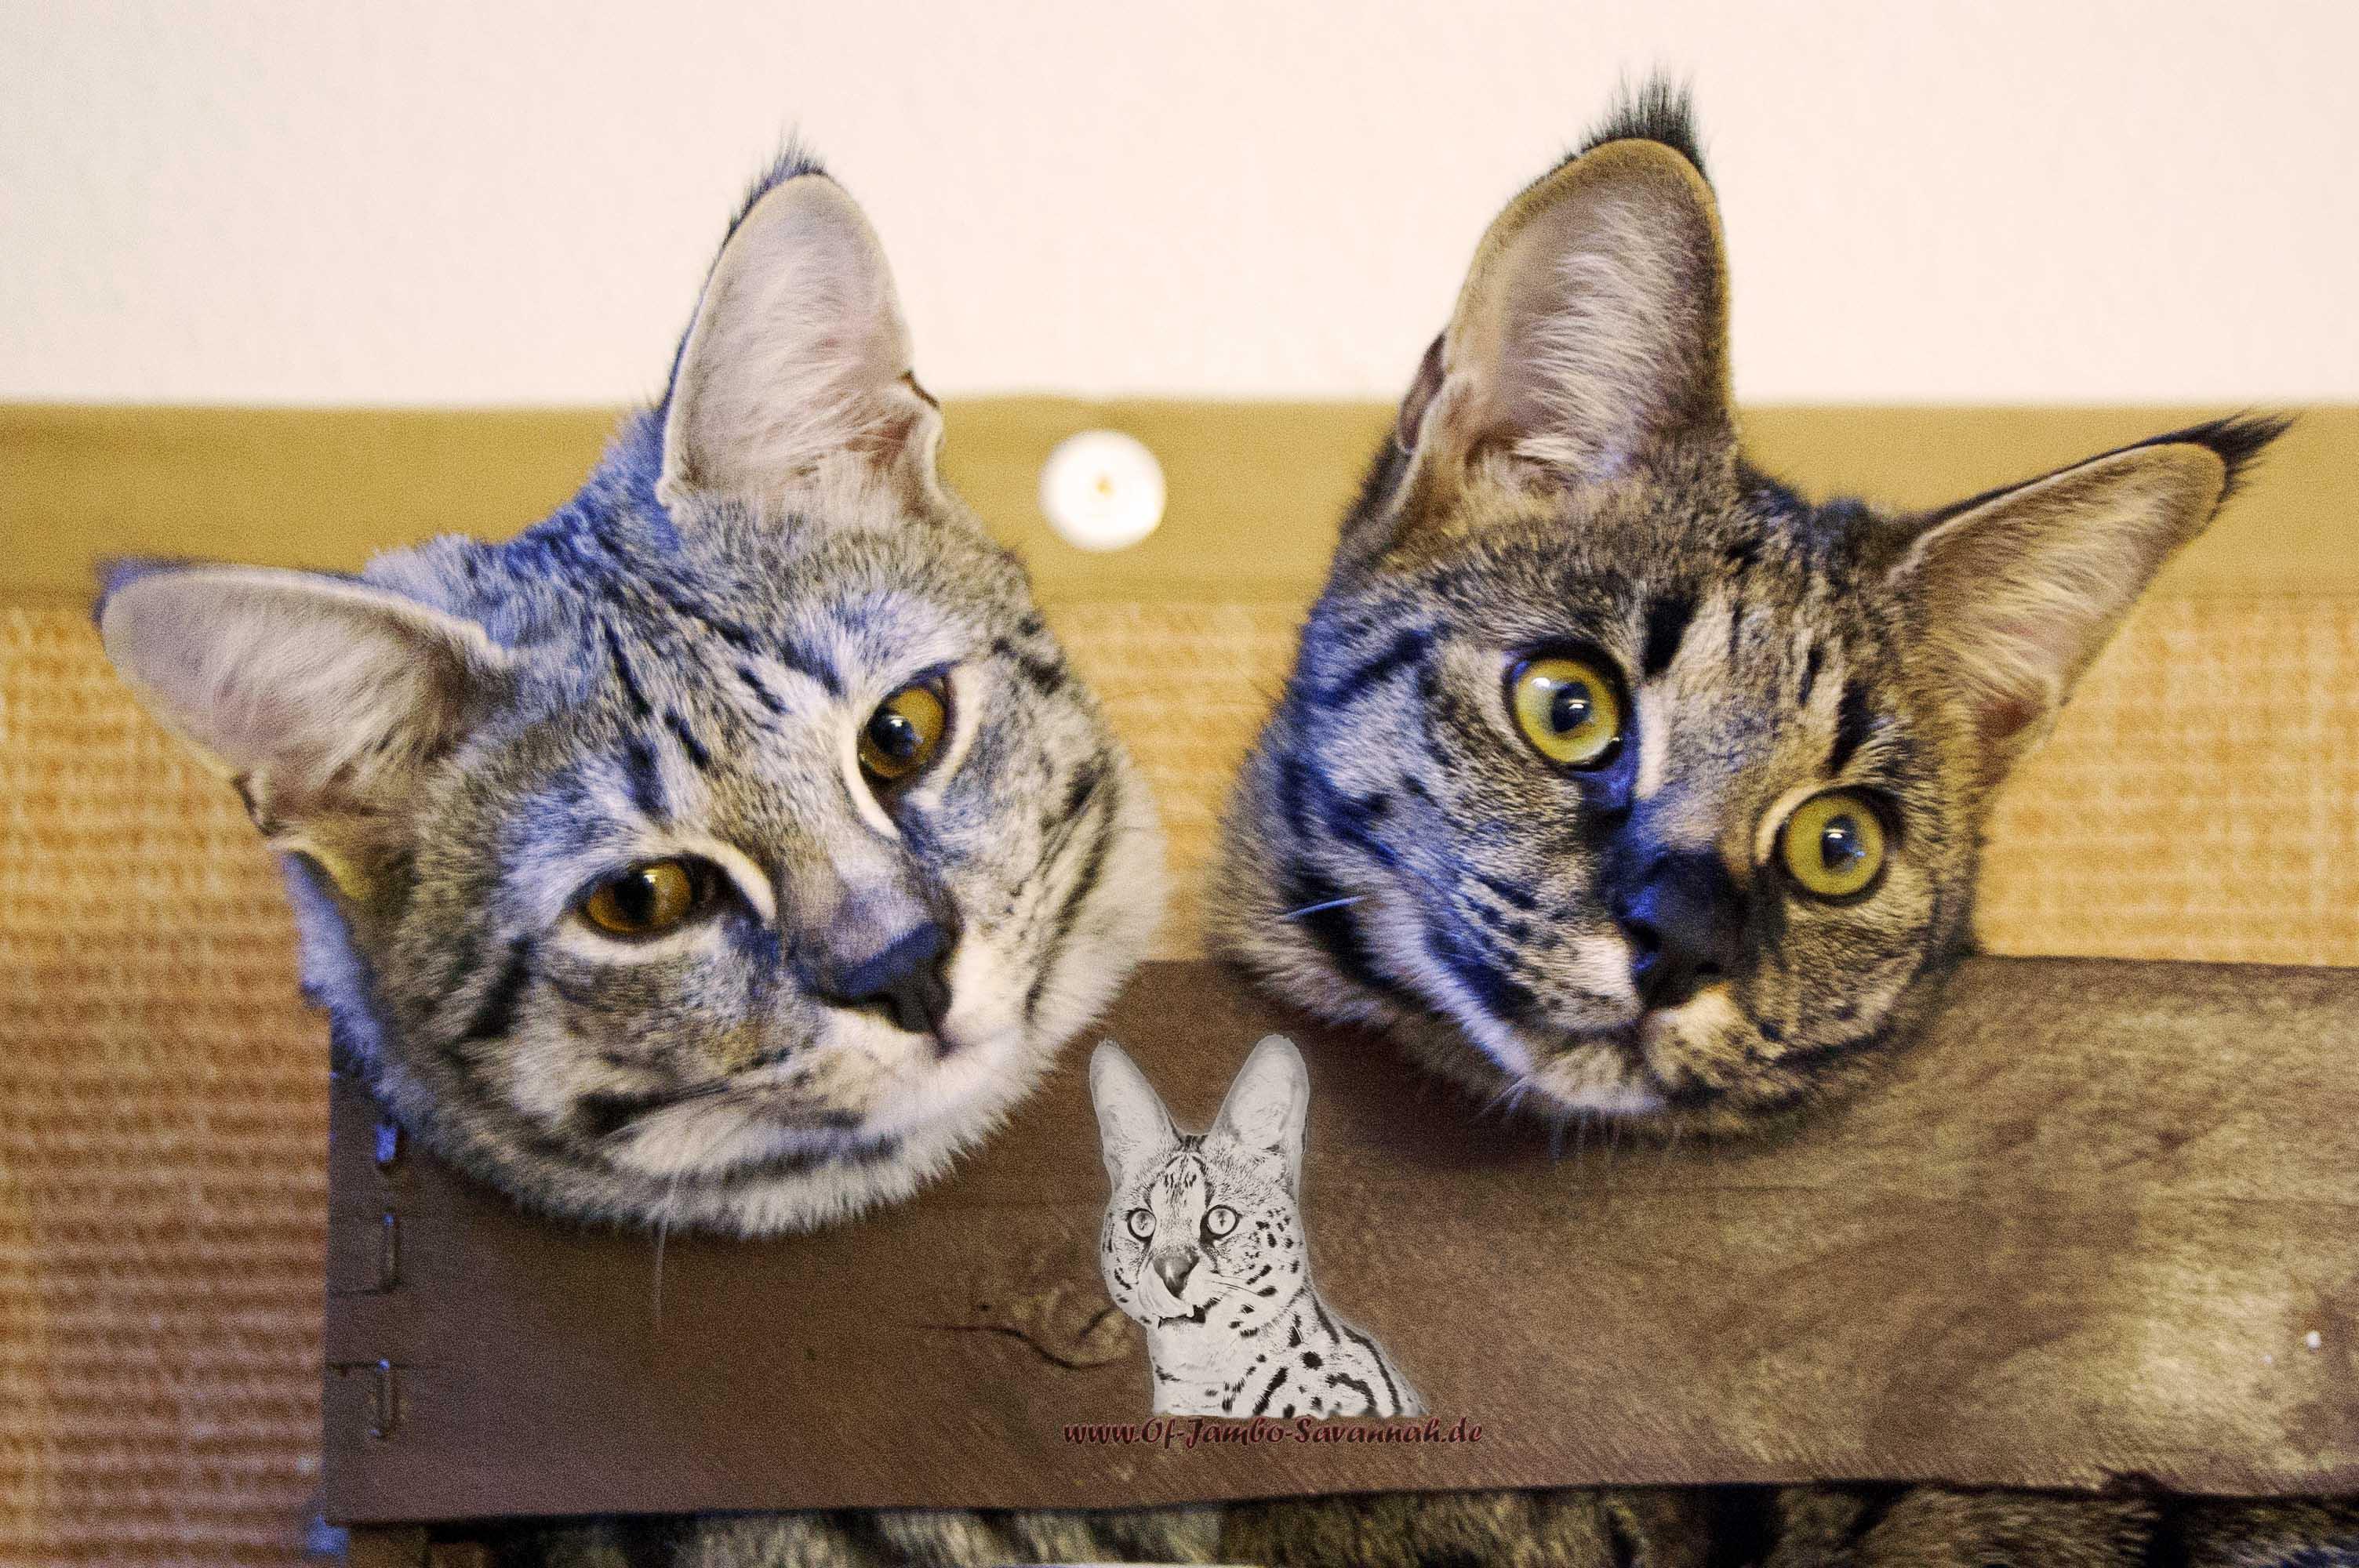 f1 savannah emma und elli of jambo savannah cats. Black Bedroom Furniture Sets. Home Design Ideas